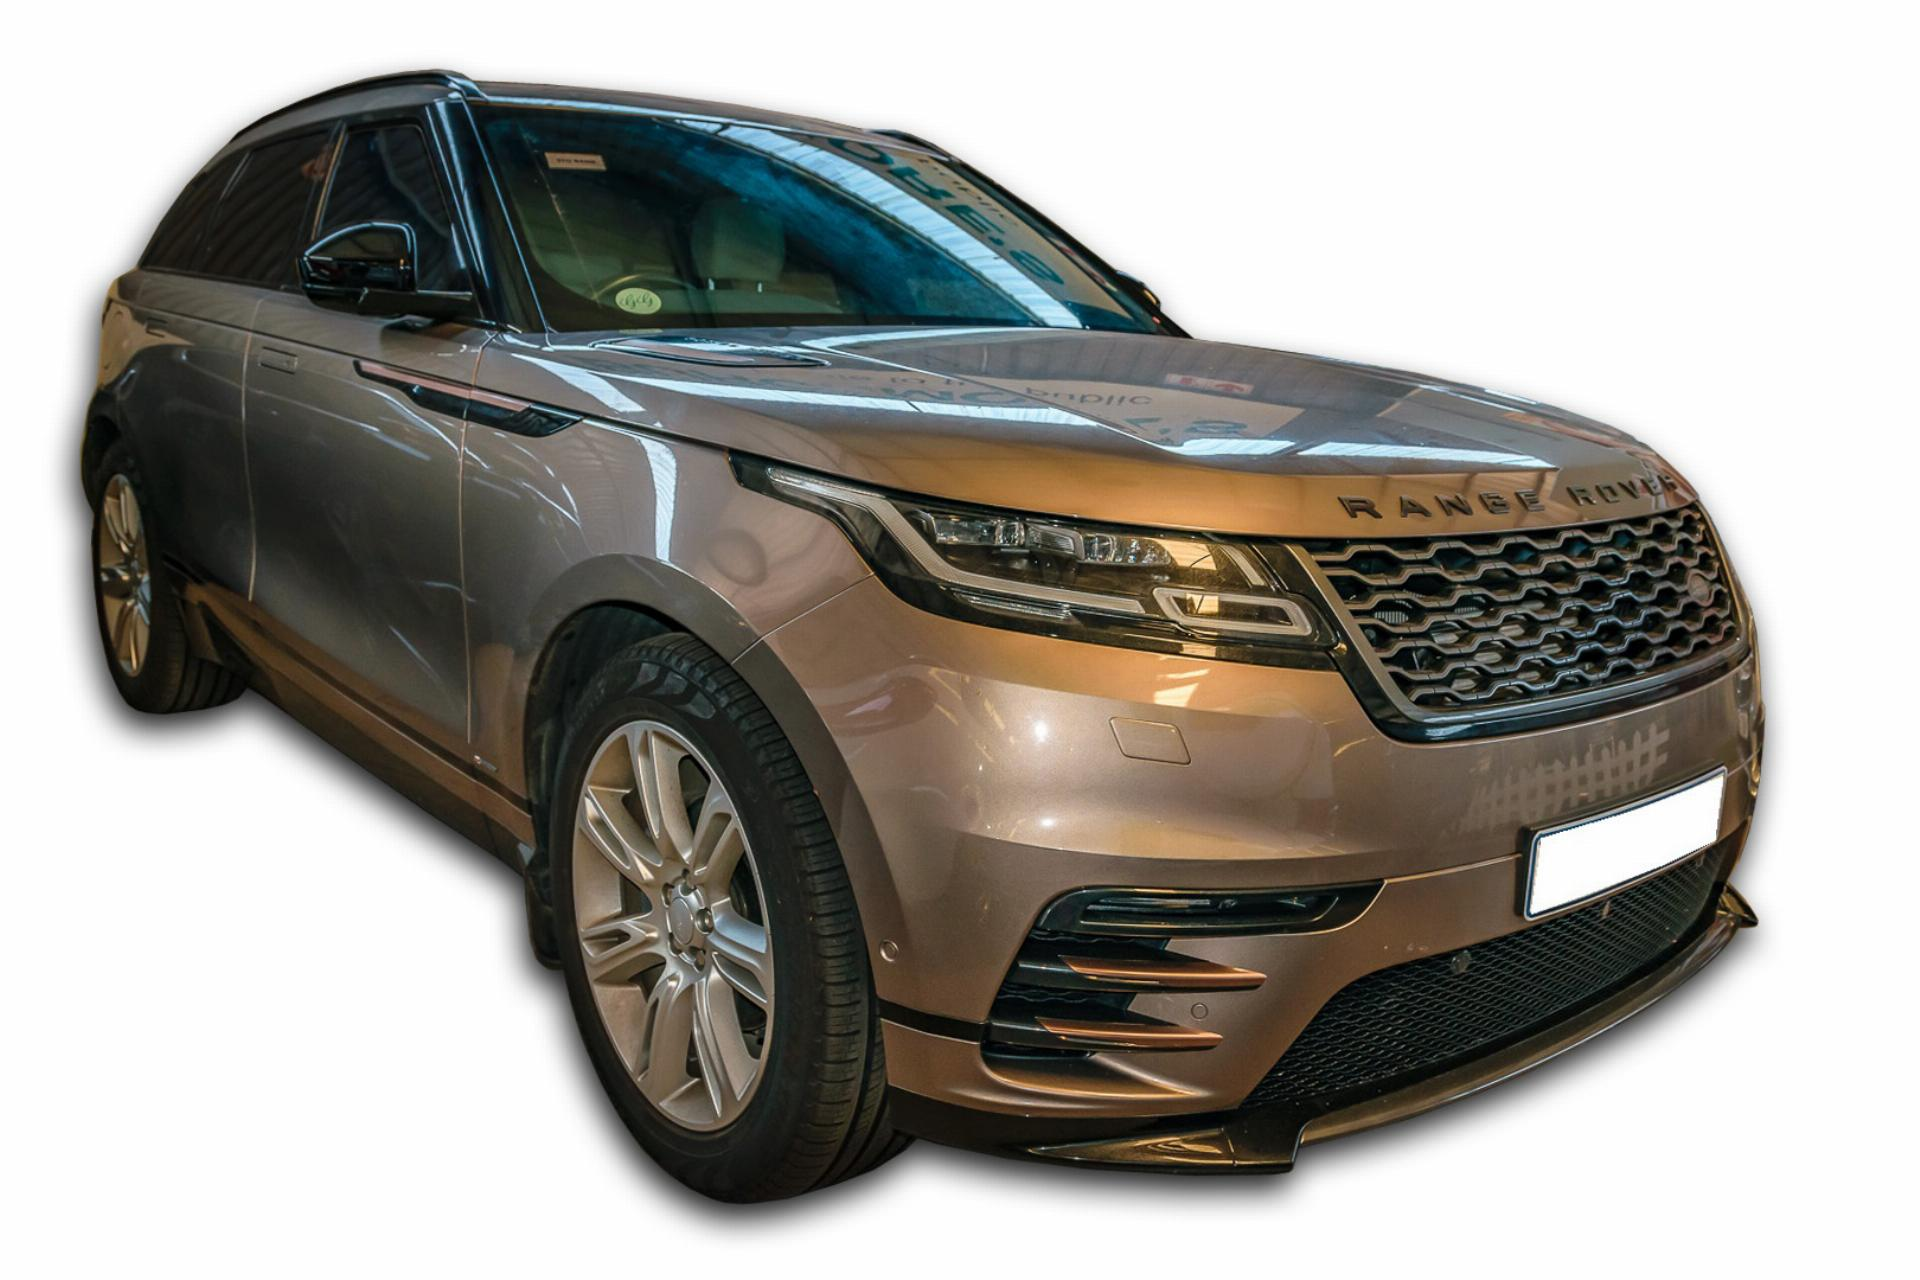 Range Rover Evoque Land Rover Velar 2.0 D SE